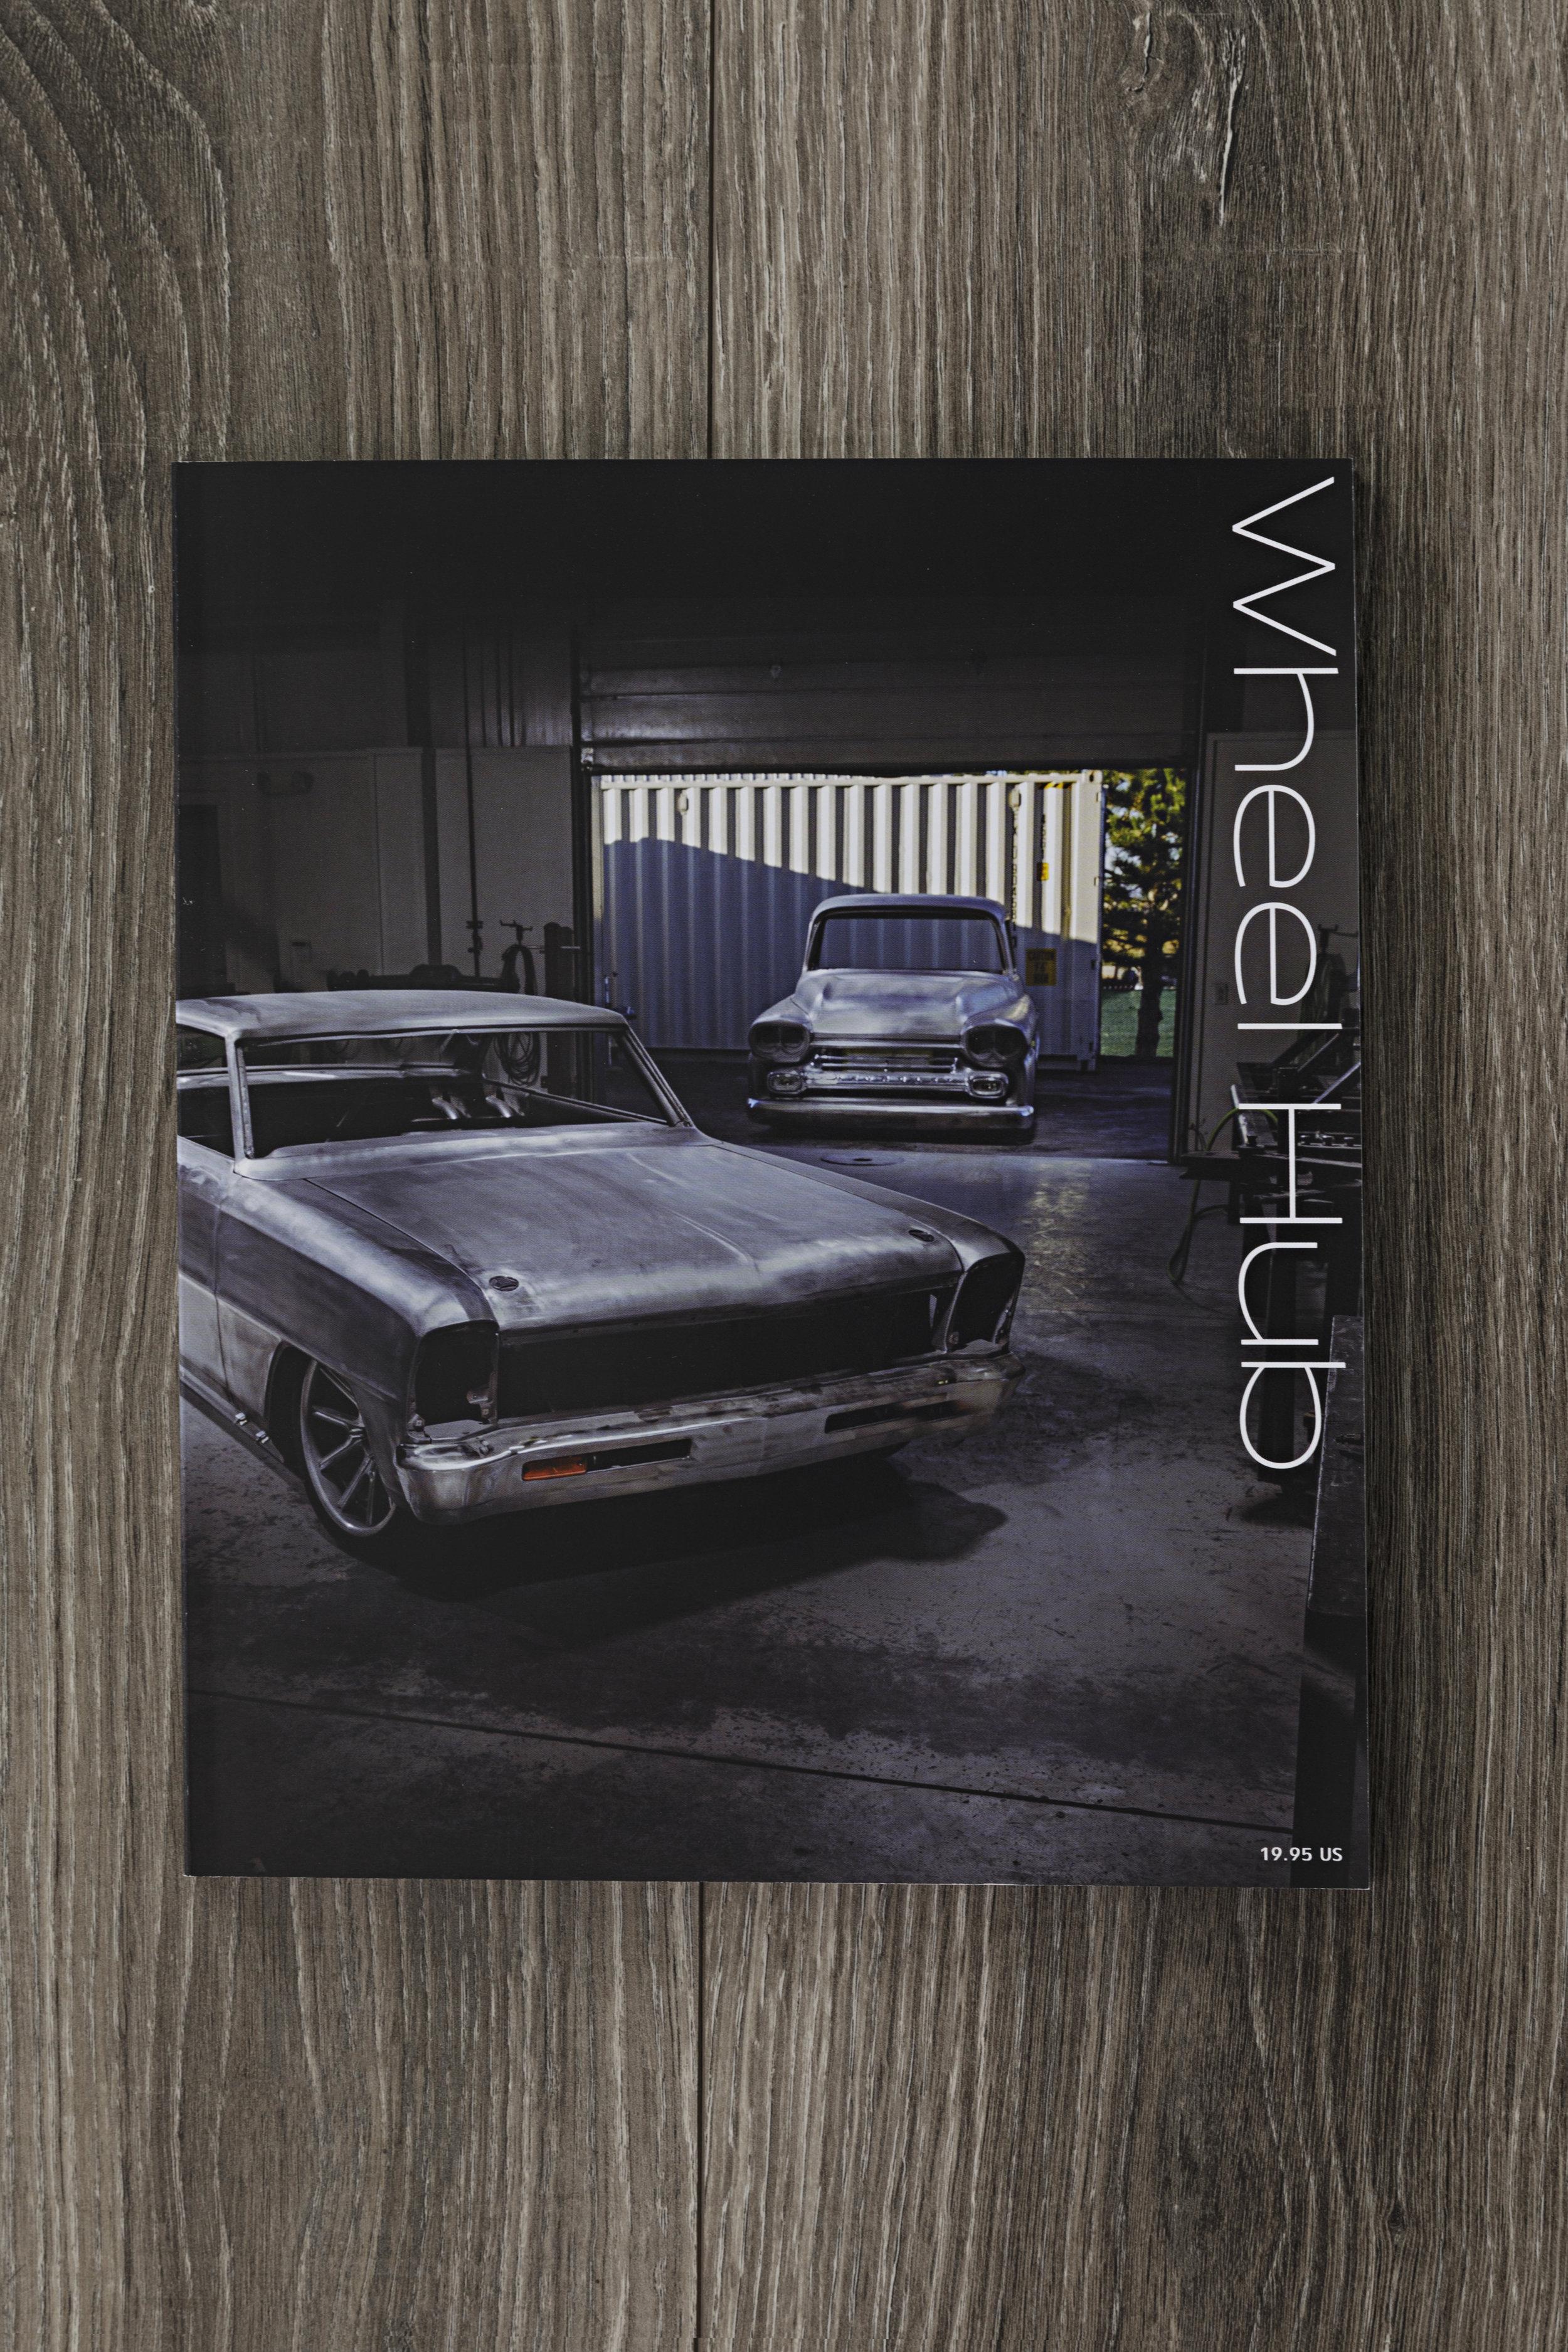 WHM_Issue1_20180208_0005.jpg